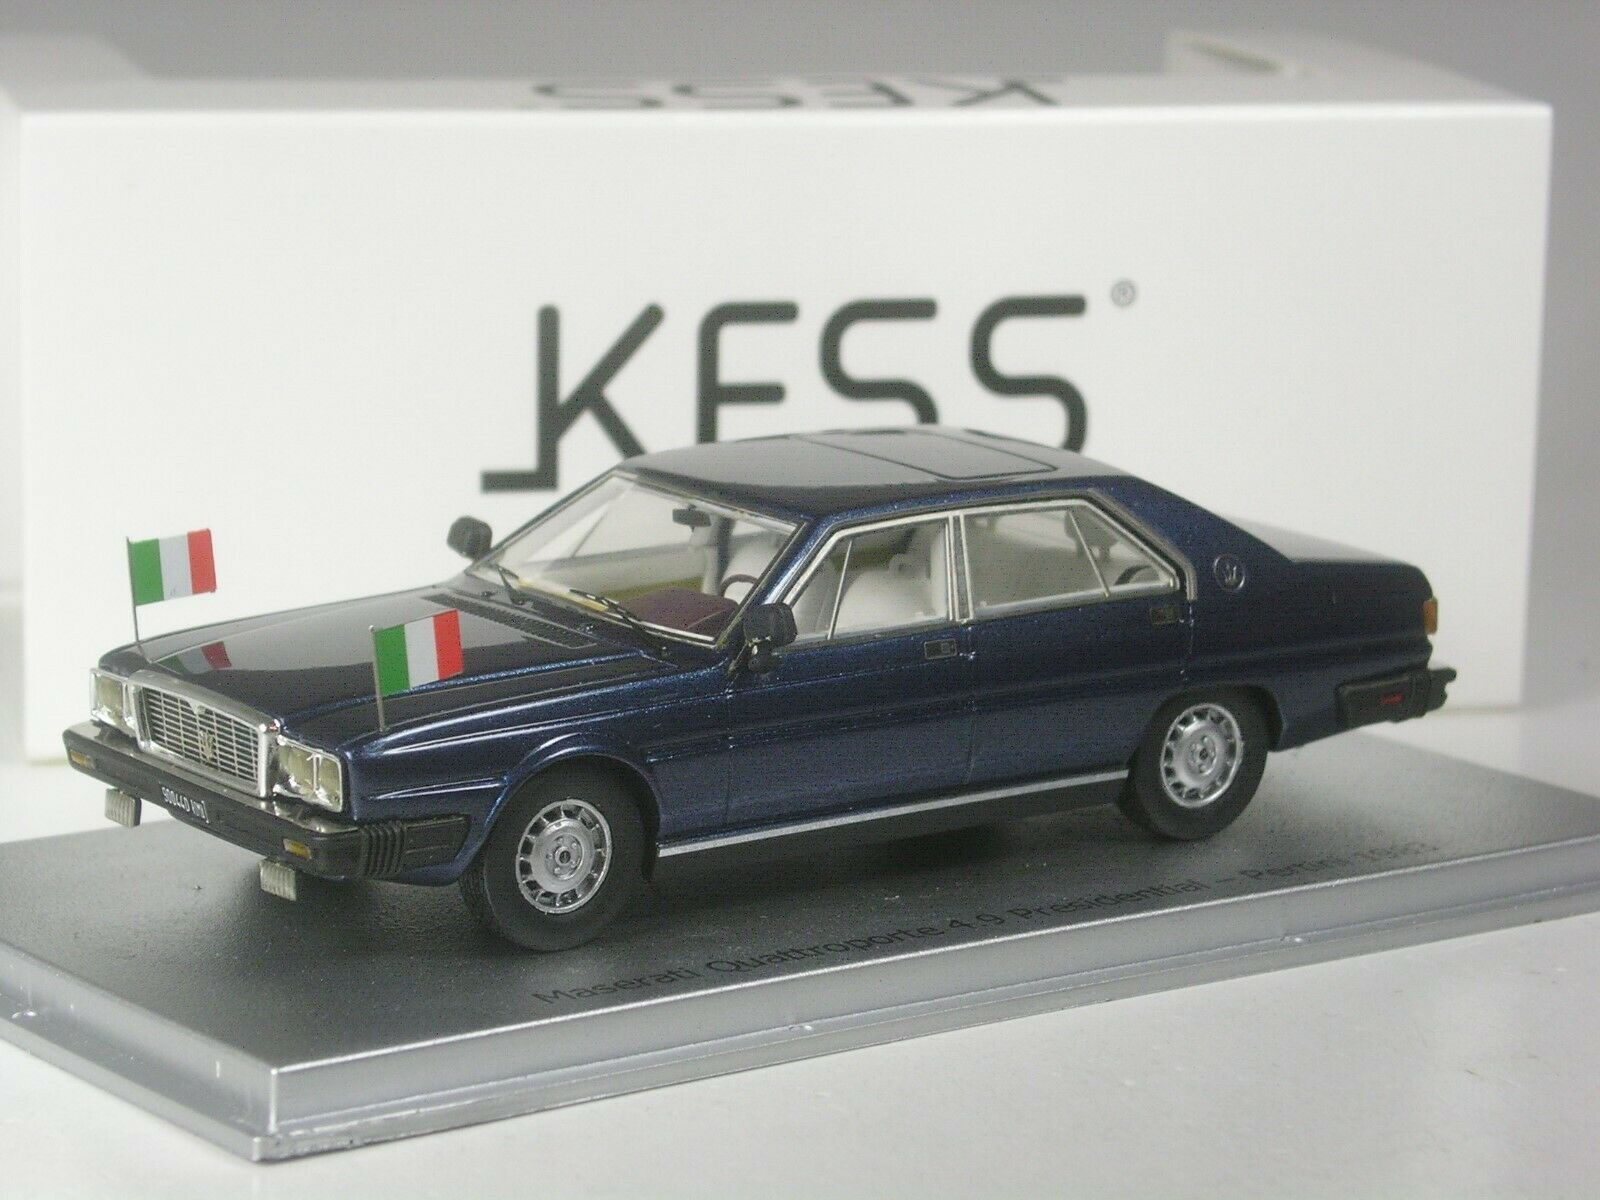 (ki-11-19) kess Maserati Quattroporte 4,9 presidential Pertini 1983 1 43 en OVP